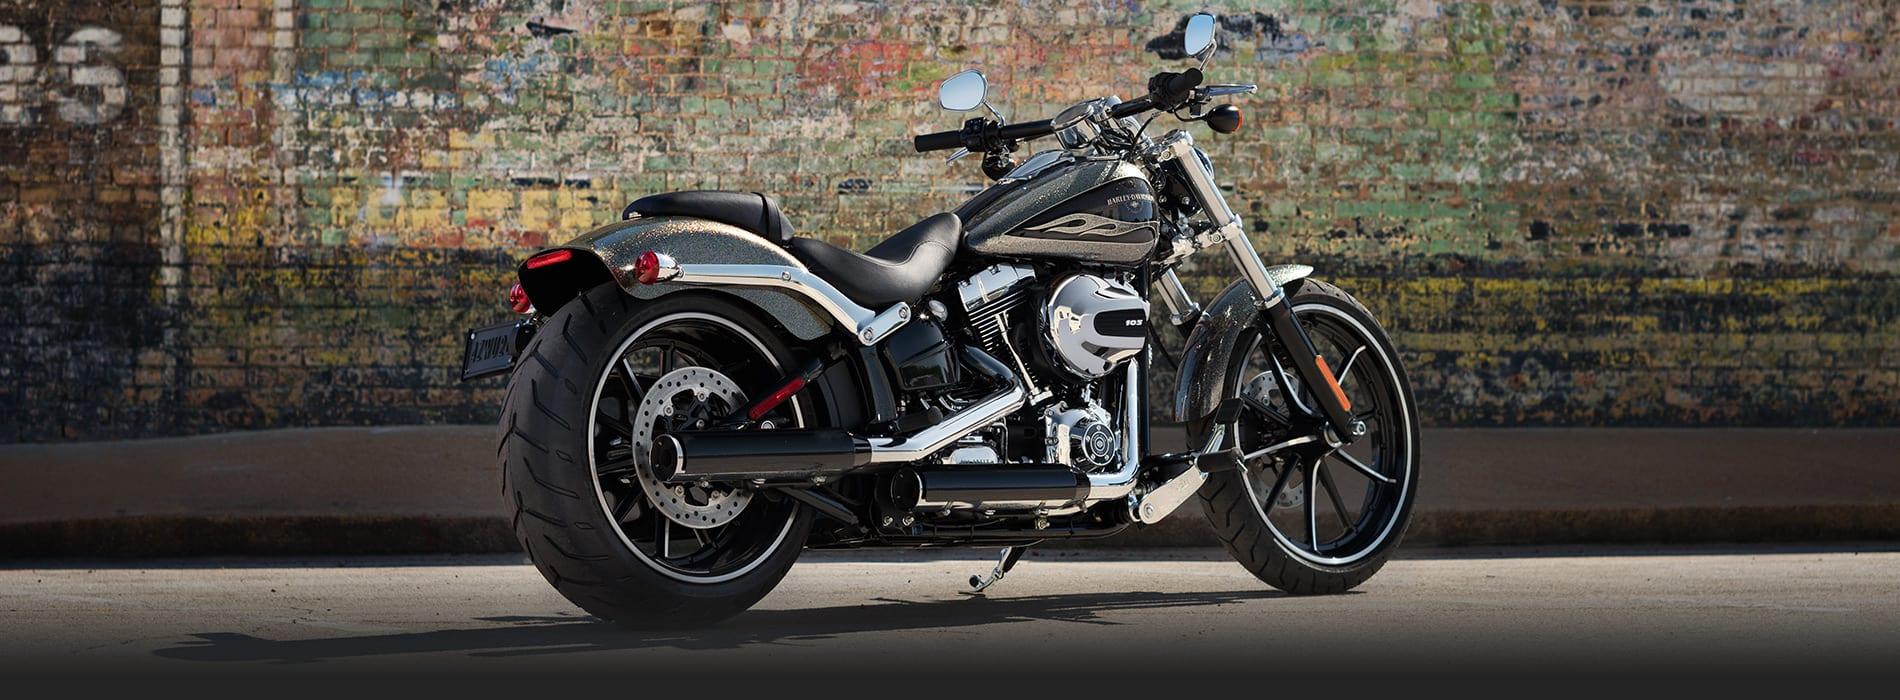 Motorcycle History Check Cyclevin